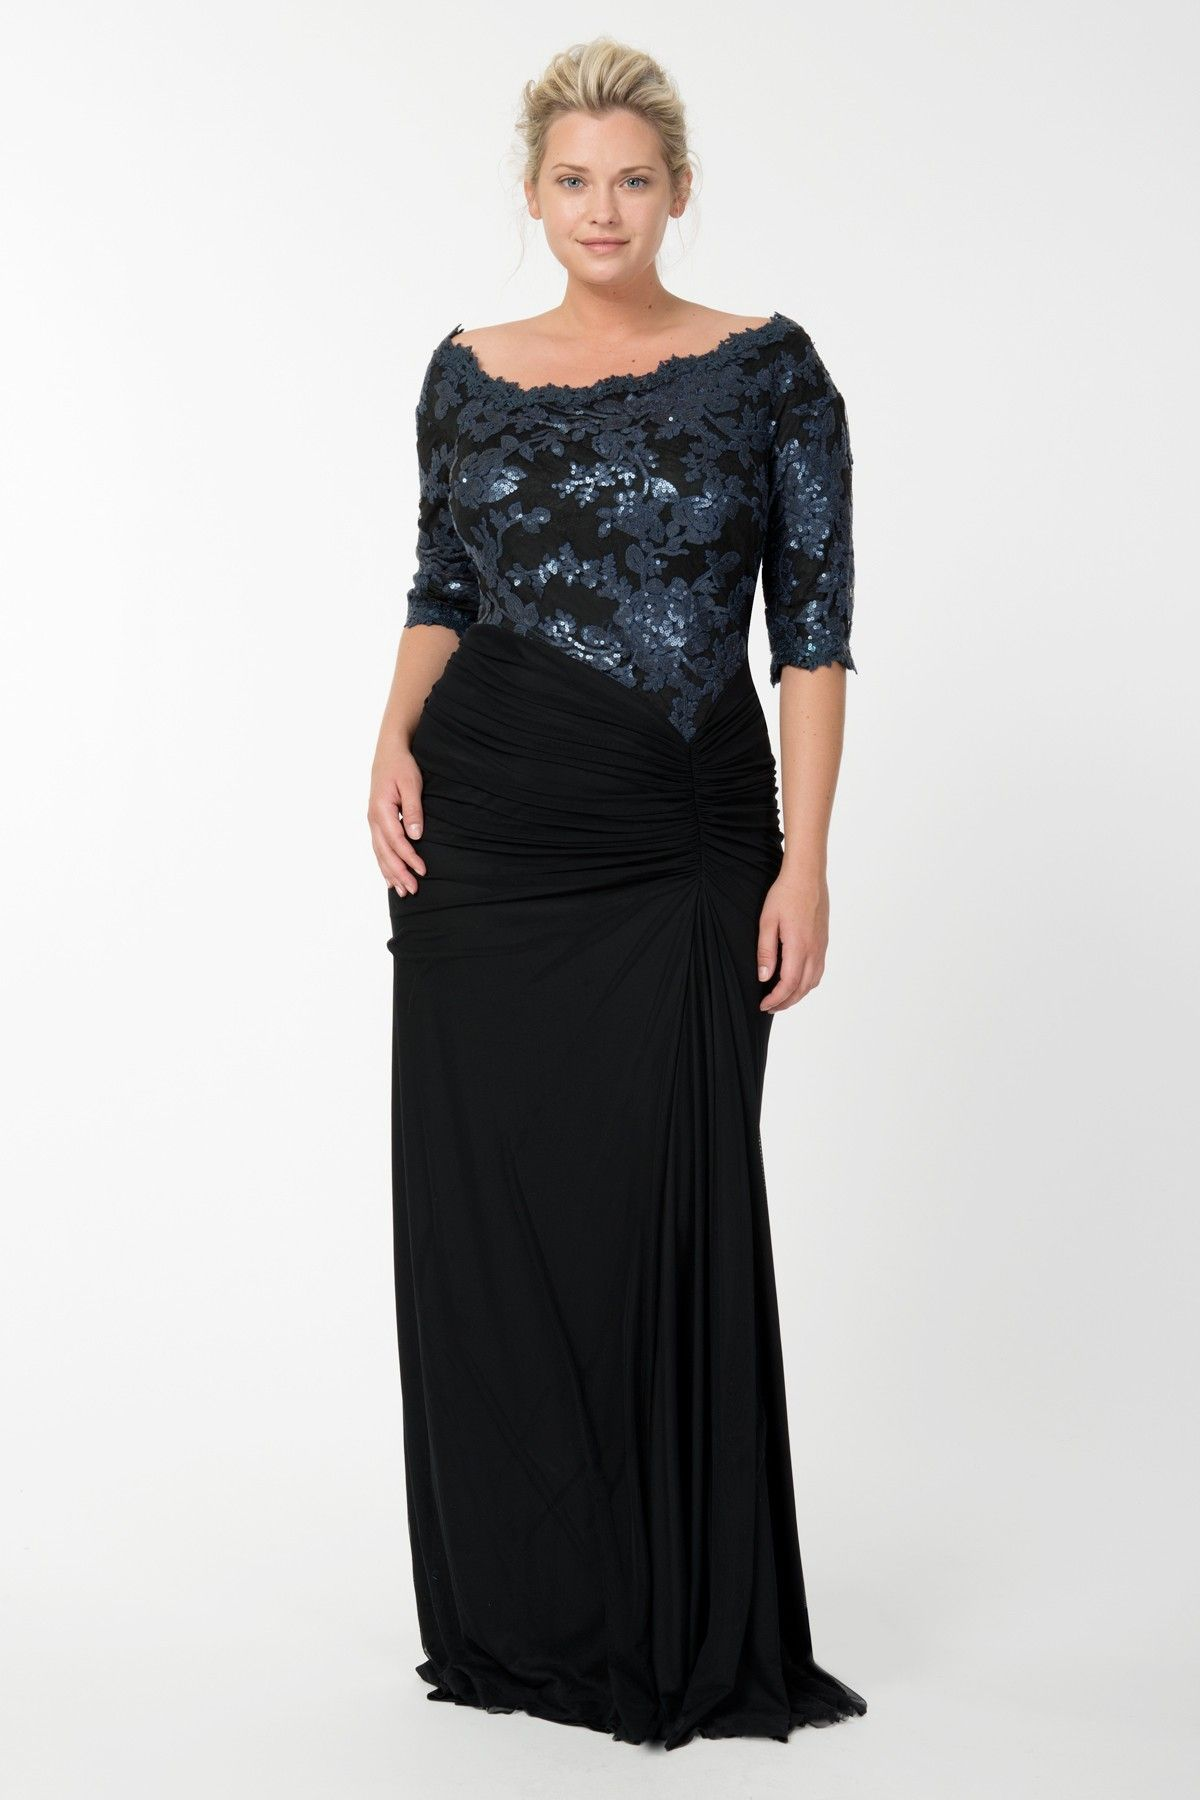 Sequin lace asymmetric gown in prussian blue black plus size